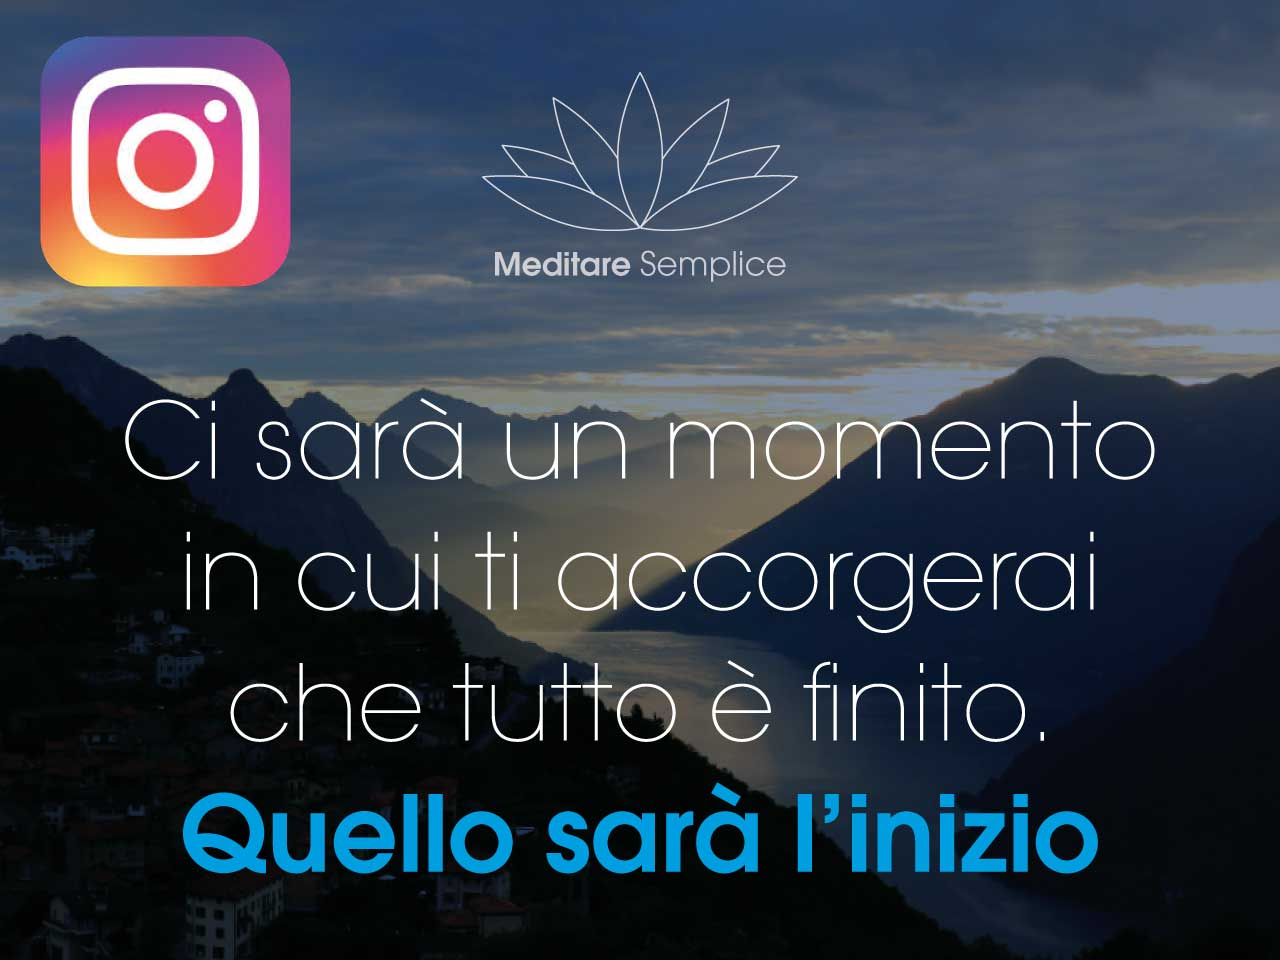 https://meditaedanza.com/wp-content/uploads/2020/12/meditare-instagram.jpg